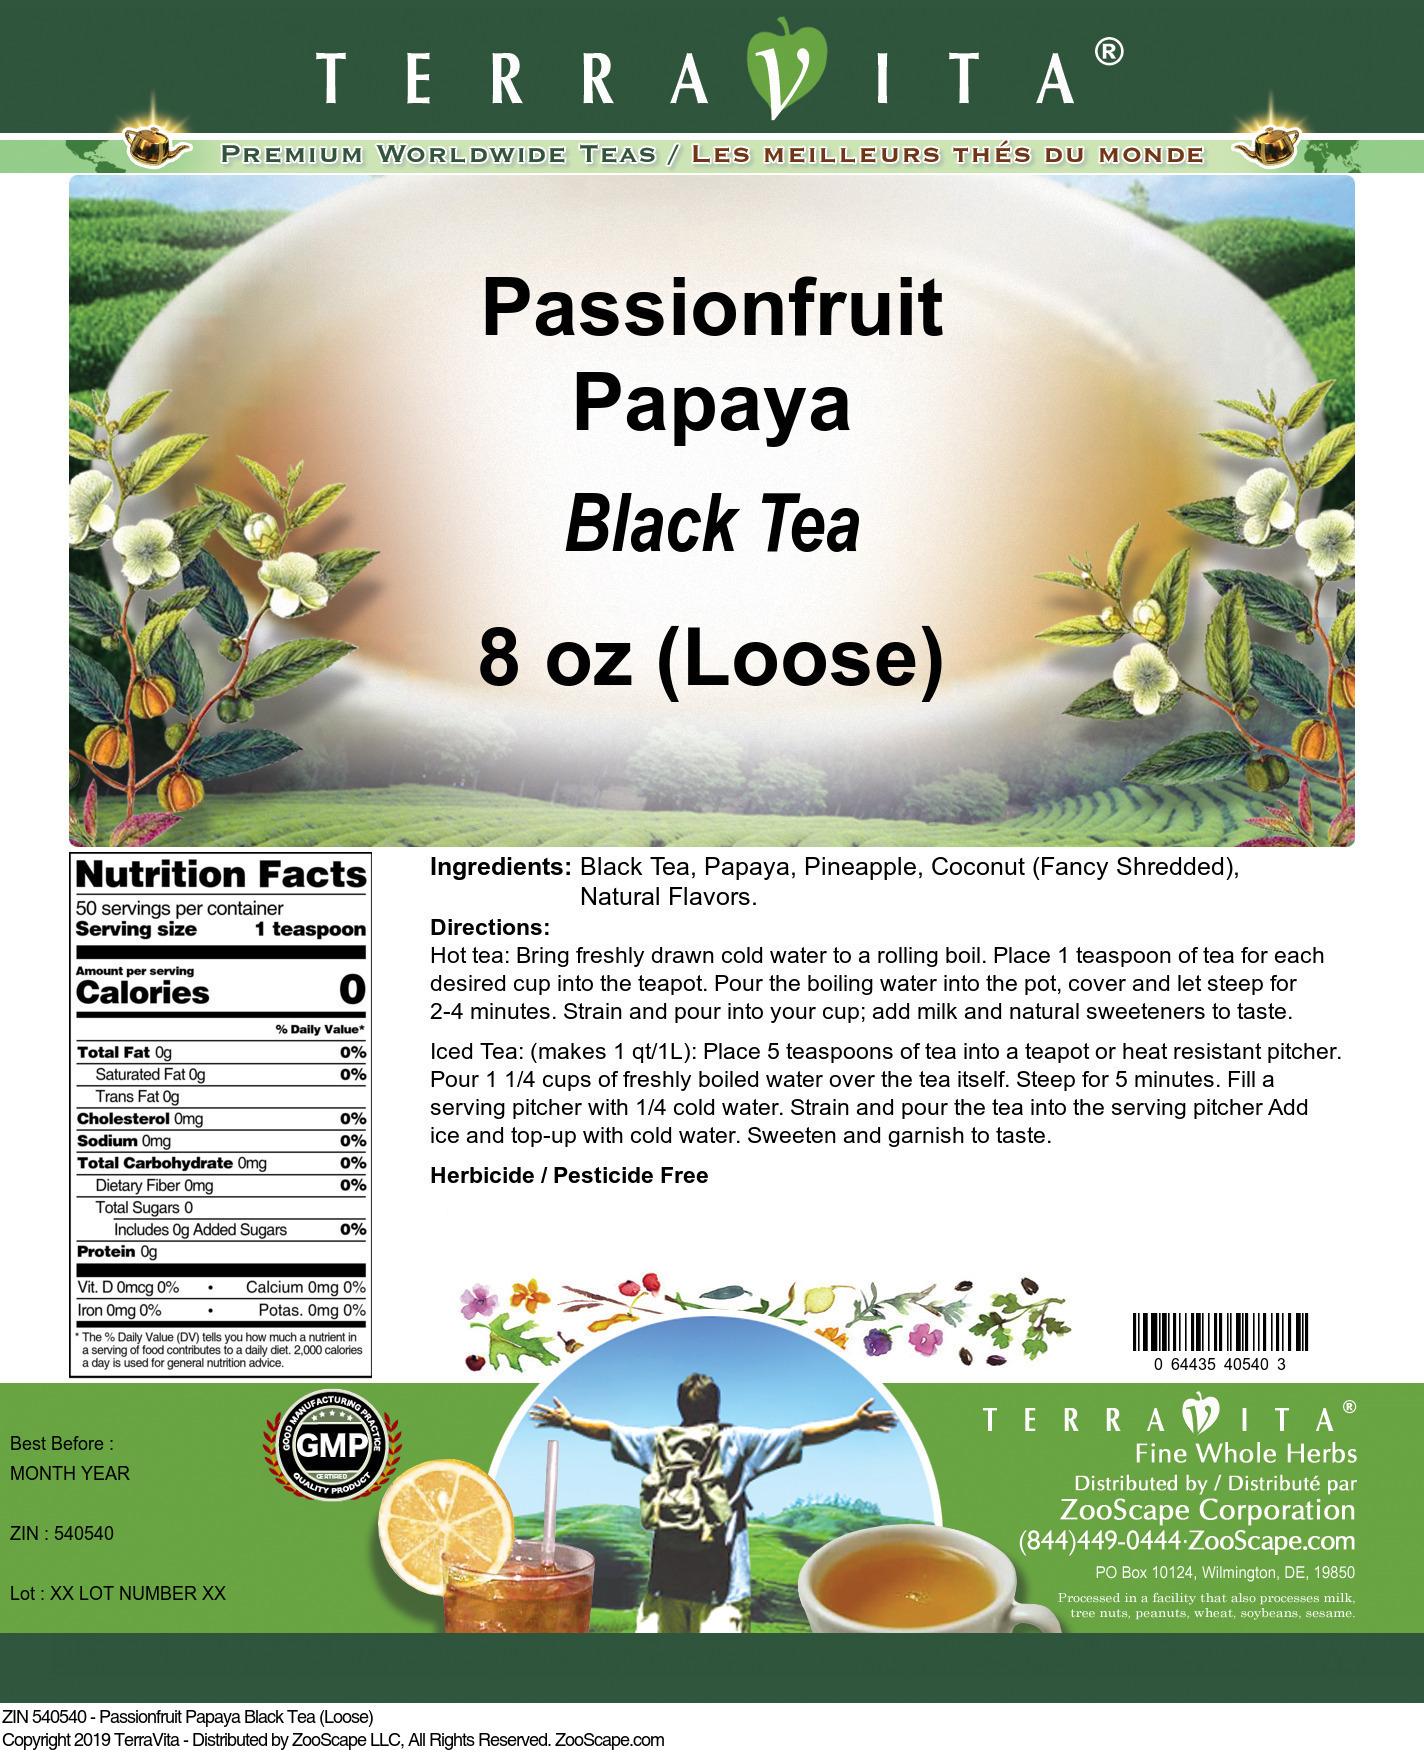 Passionfruit Papaya Black Tea